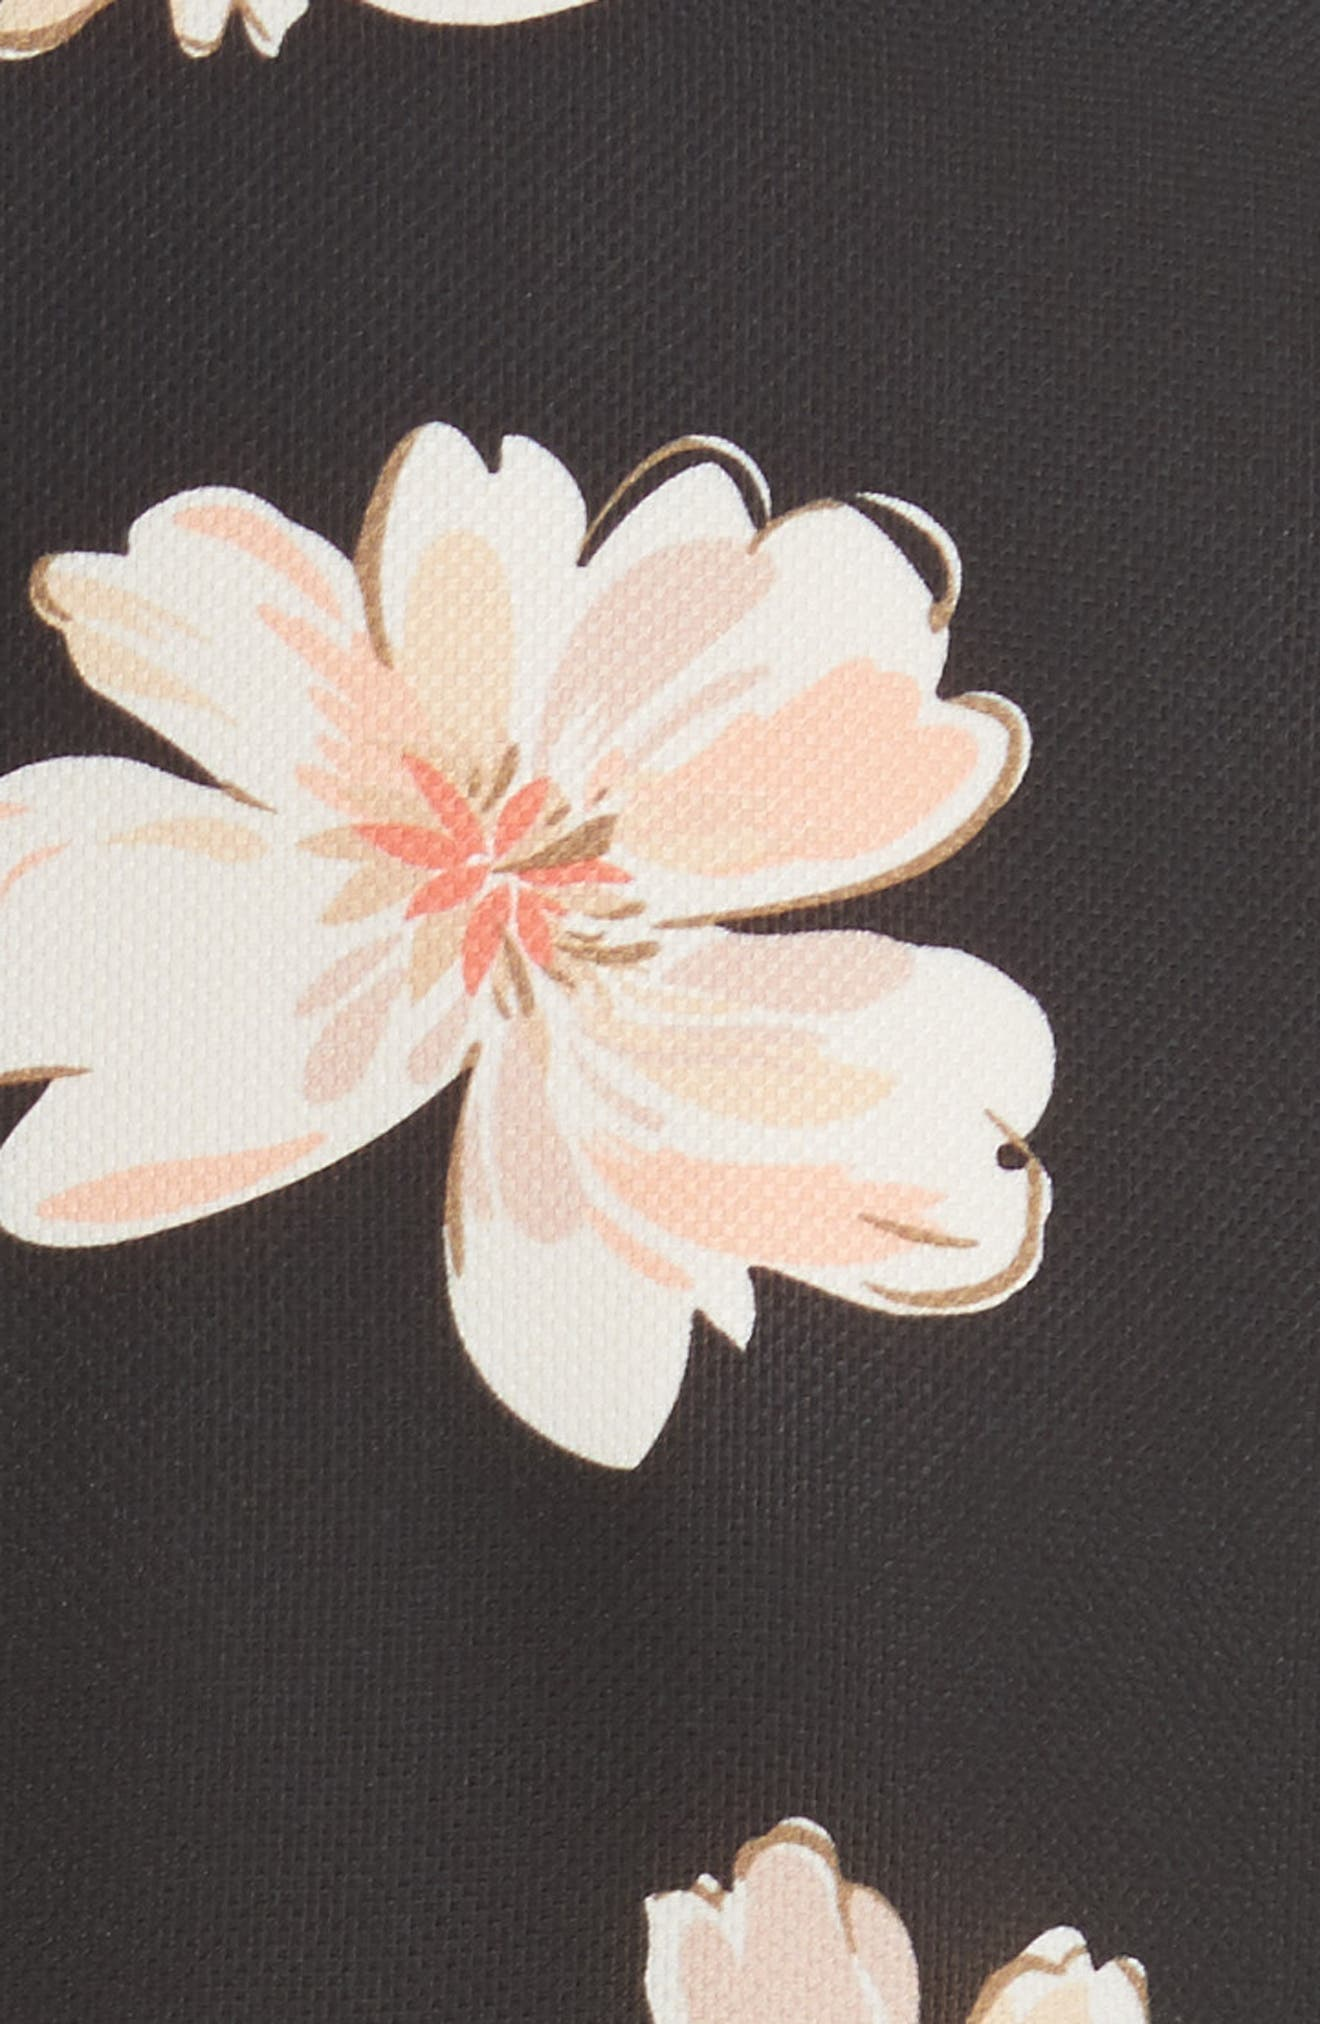 Arka Winterfloral Belted Midi Dress,                             Alternate thumbnail 5, color,                             Black Multi